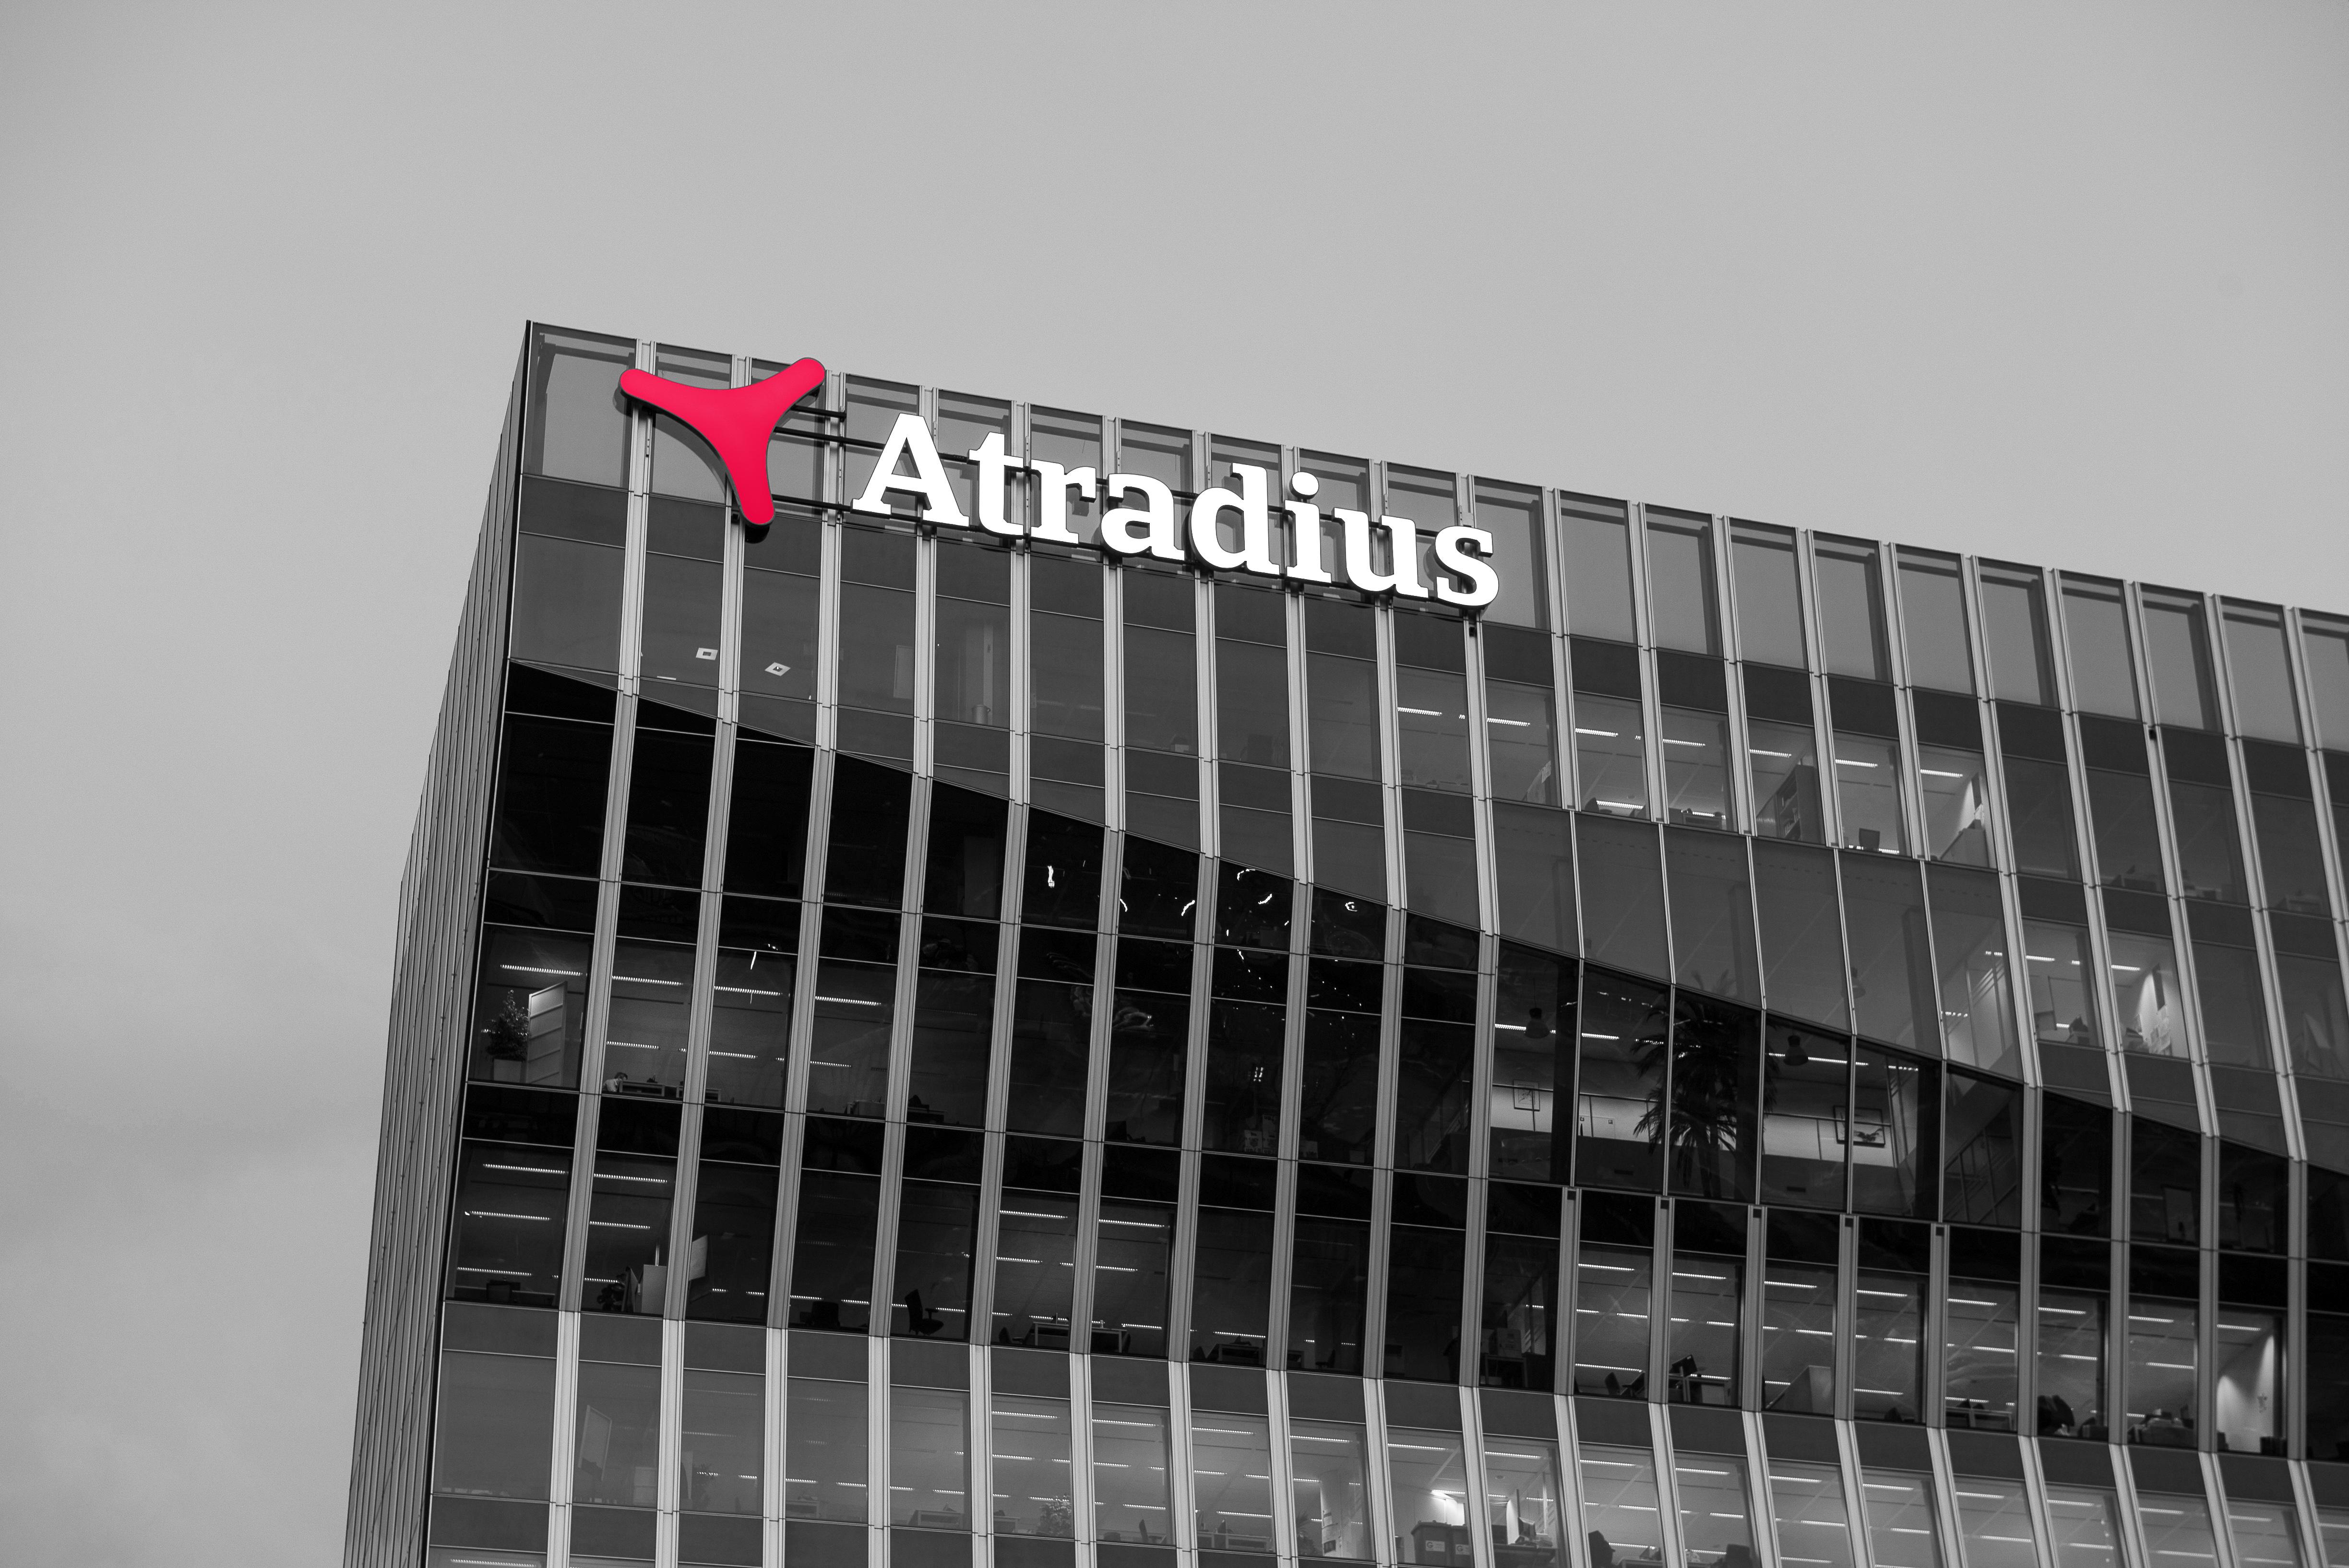 amsterdam atradius 2016 bovenkant 2016